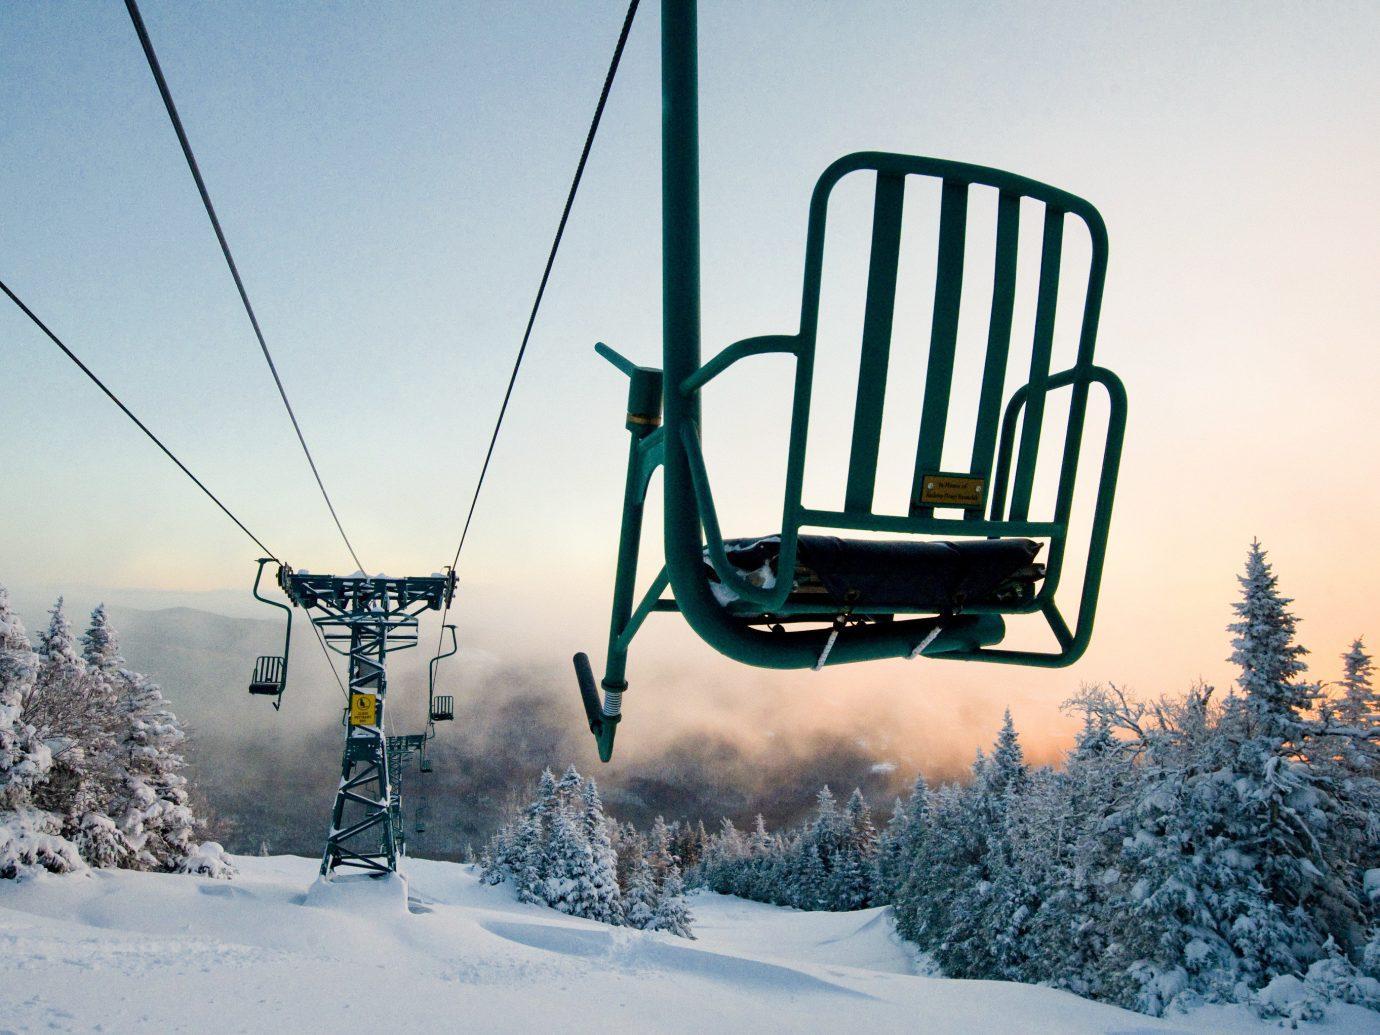 alpine skiing East Coast USA Trip Ideas ski tow sky outdoor transport snow Winter freezing tree morning frost winter sport ski equipment sunlight ice day